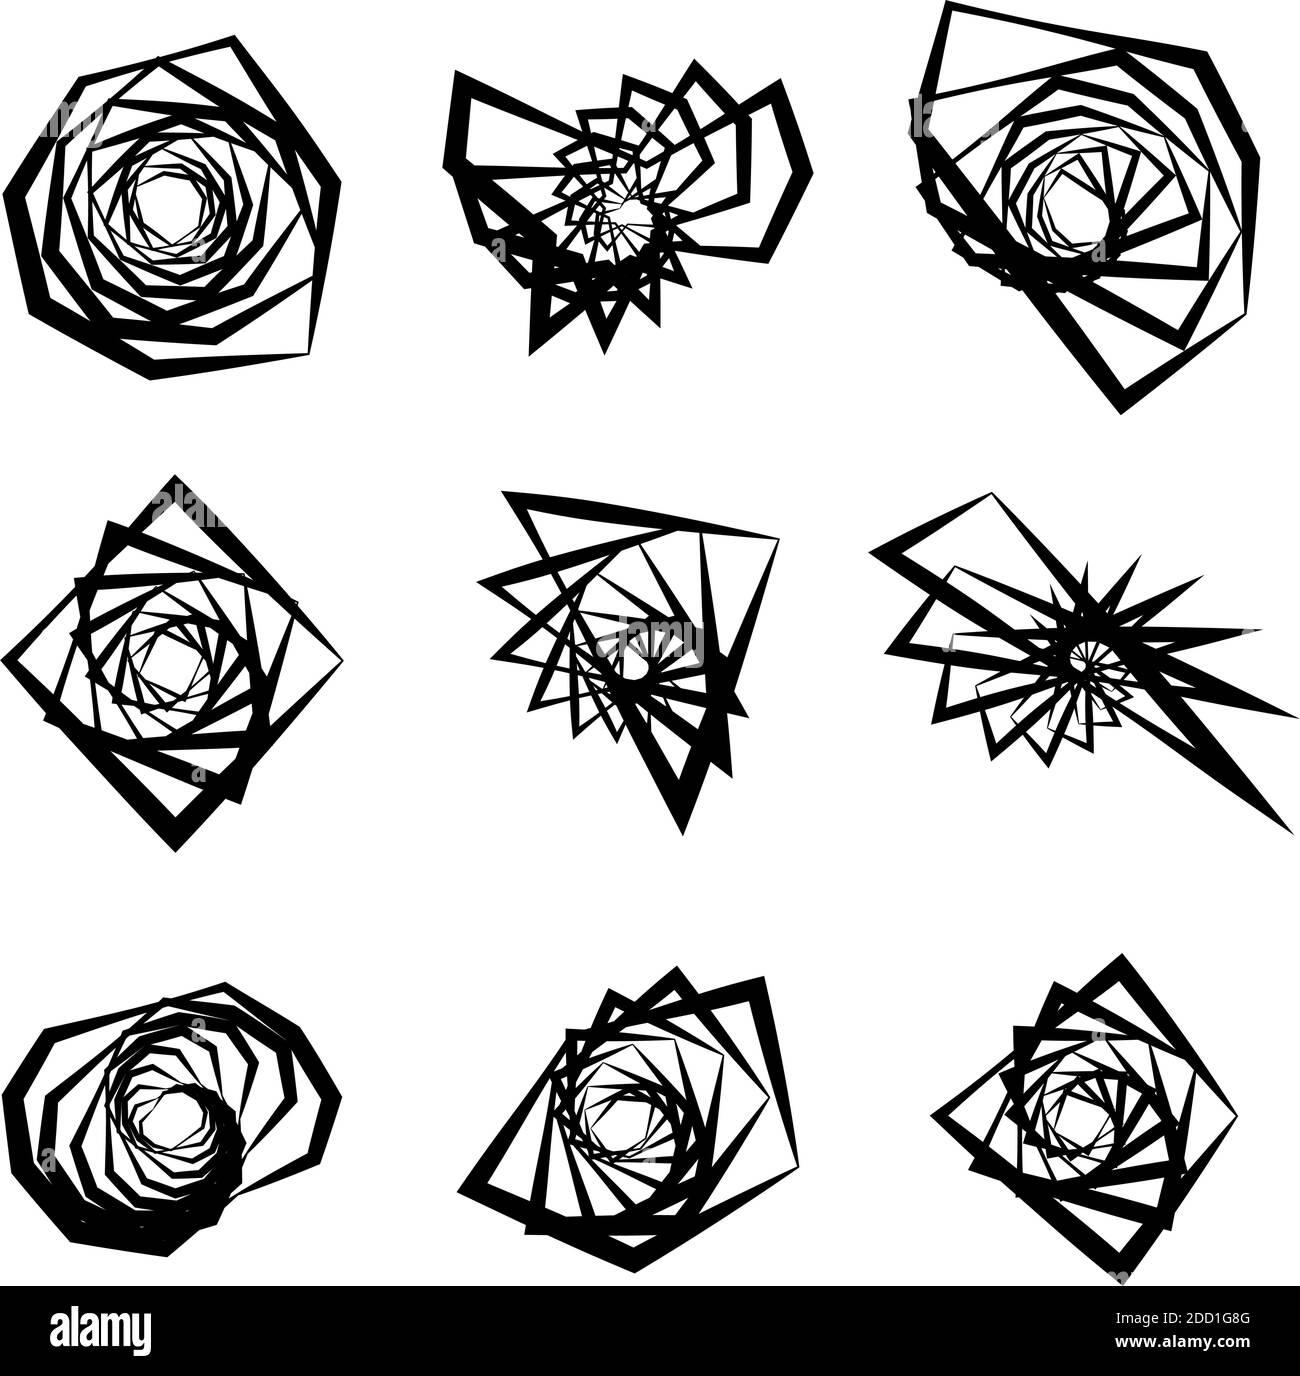 Spiral, swirl, twirl element set. Abstract vector – Stock vector illustration, Clip art graphics Stock Vector